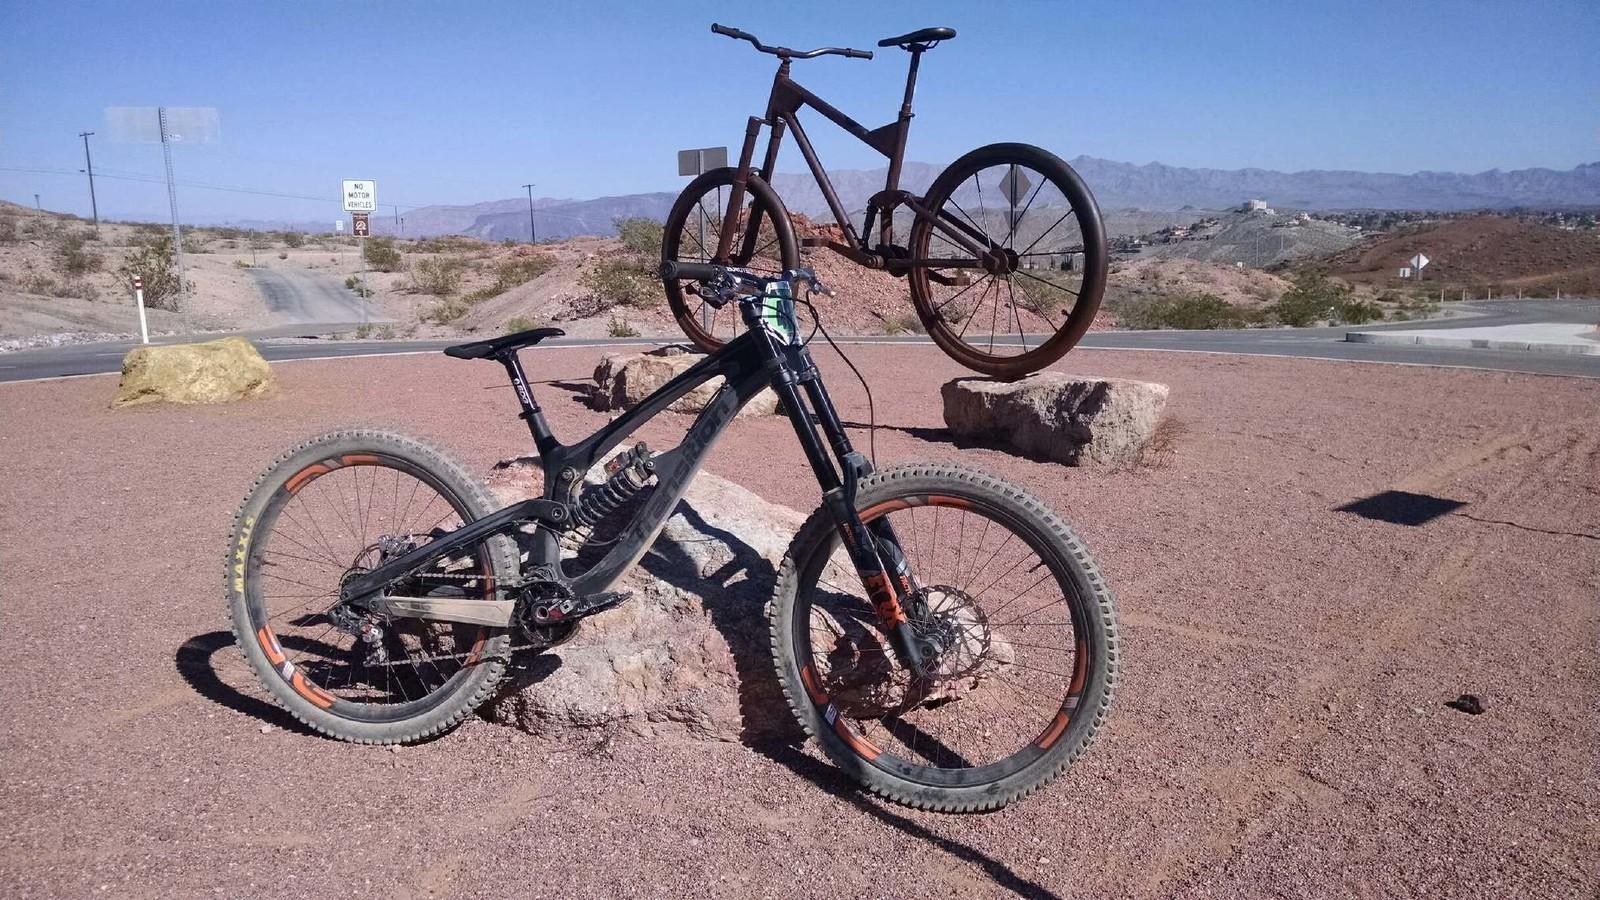 Steve Wentz's Transition TR11 Downhill Bike - Mountain Bikes